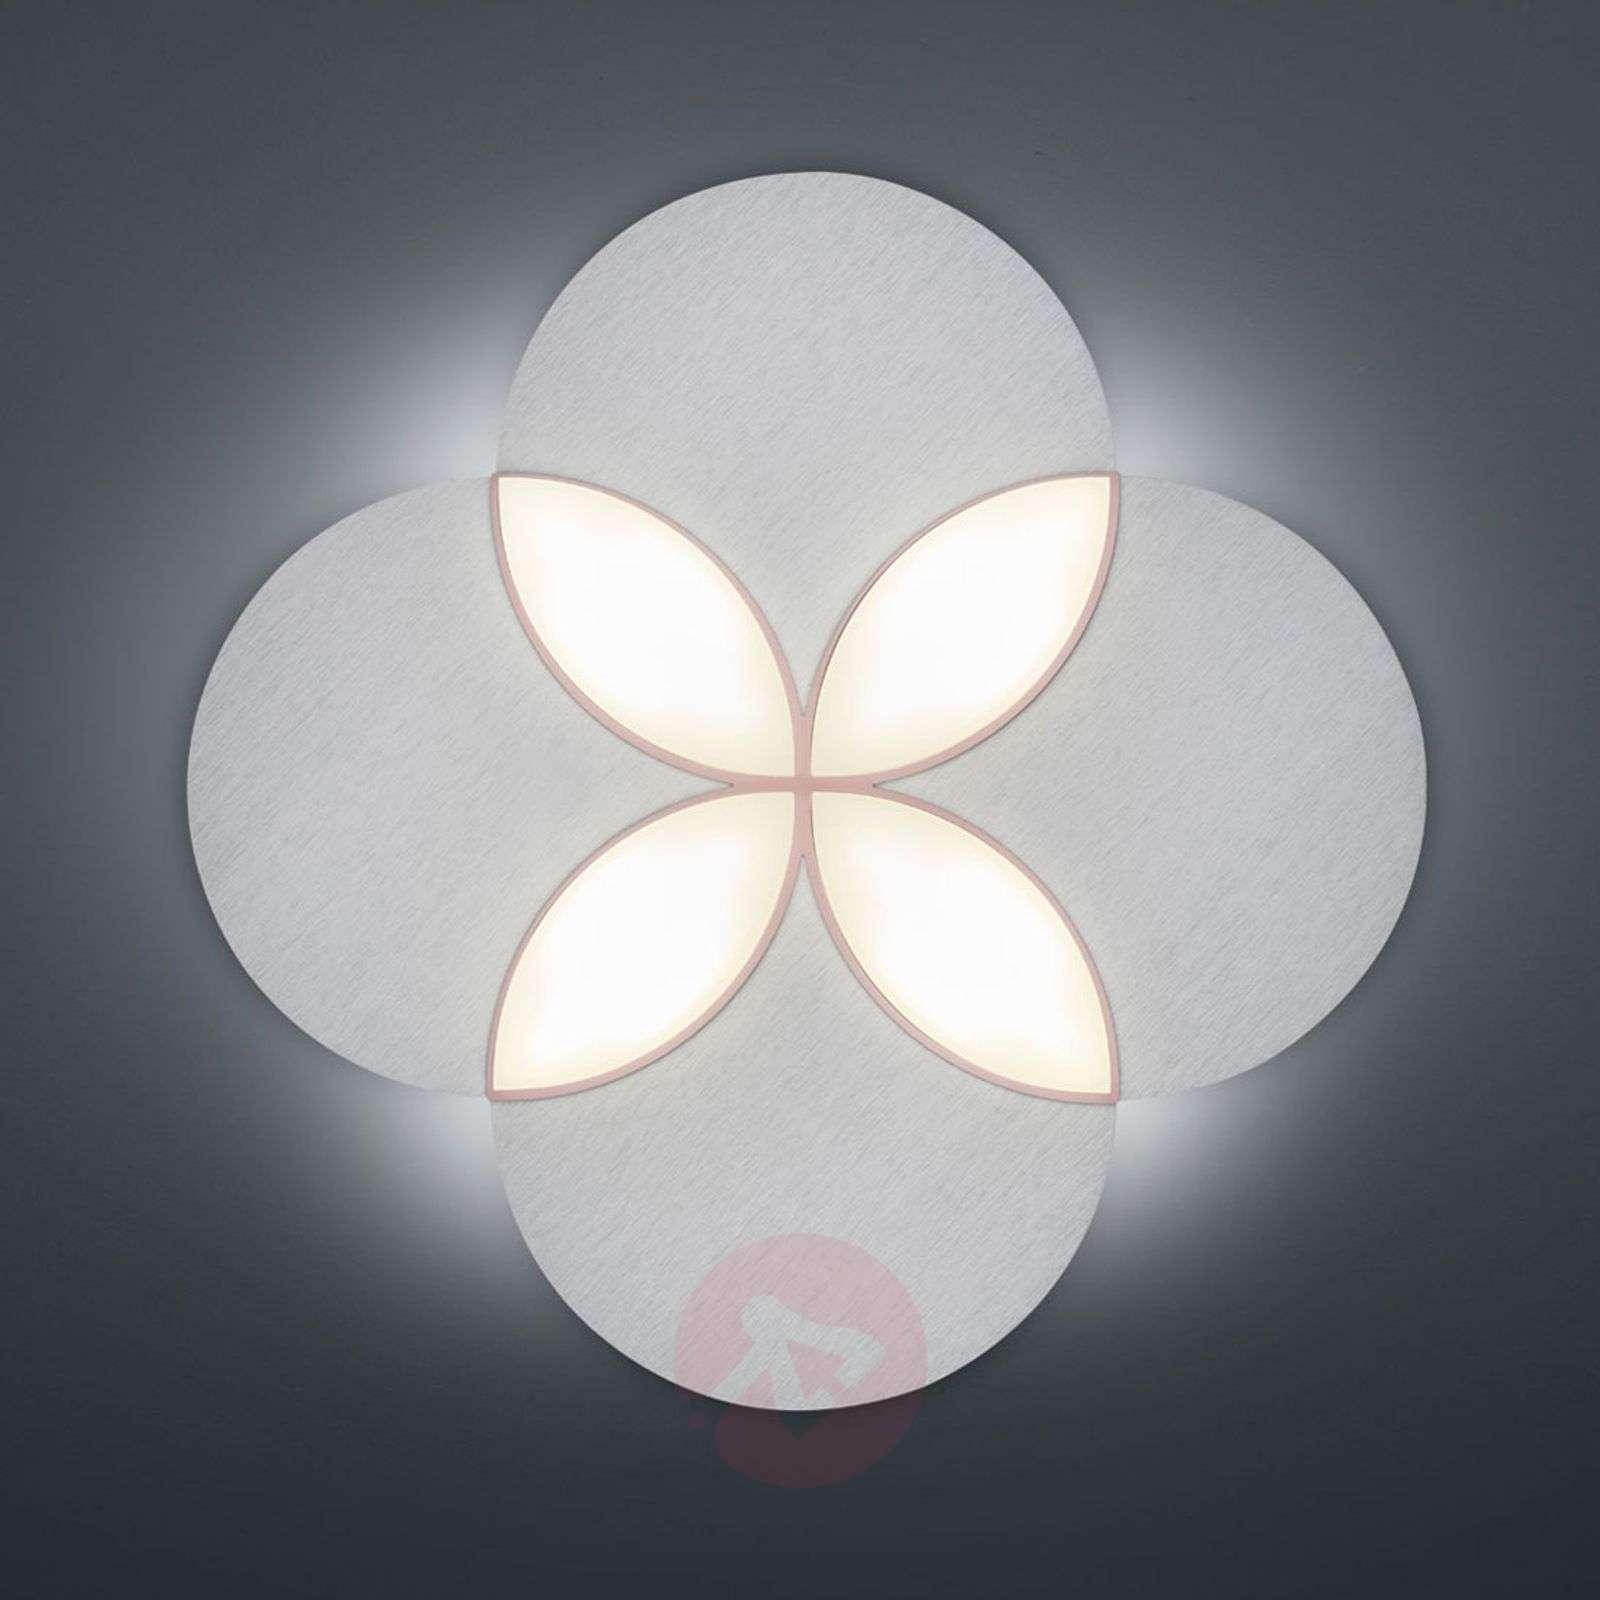 BANKAMP Spring-LED-kattovalaisin, eloksoitu hopea-1572055-01